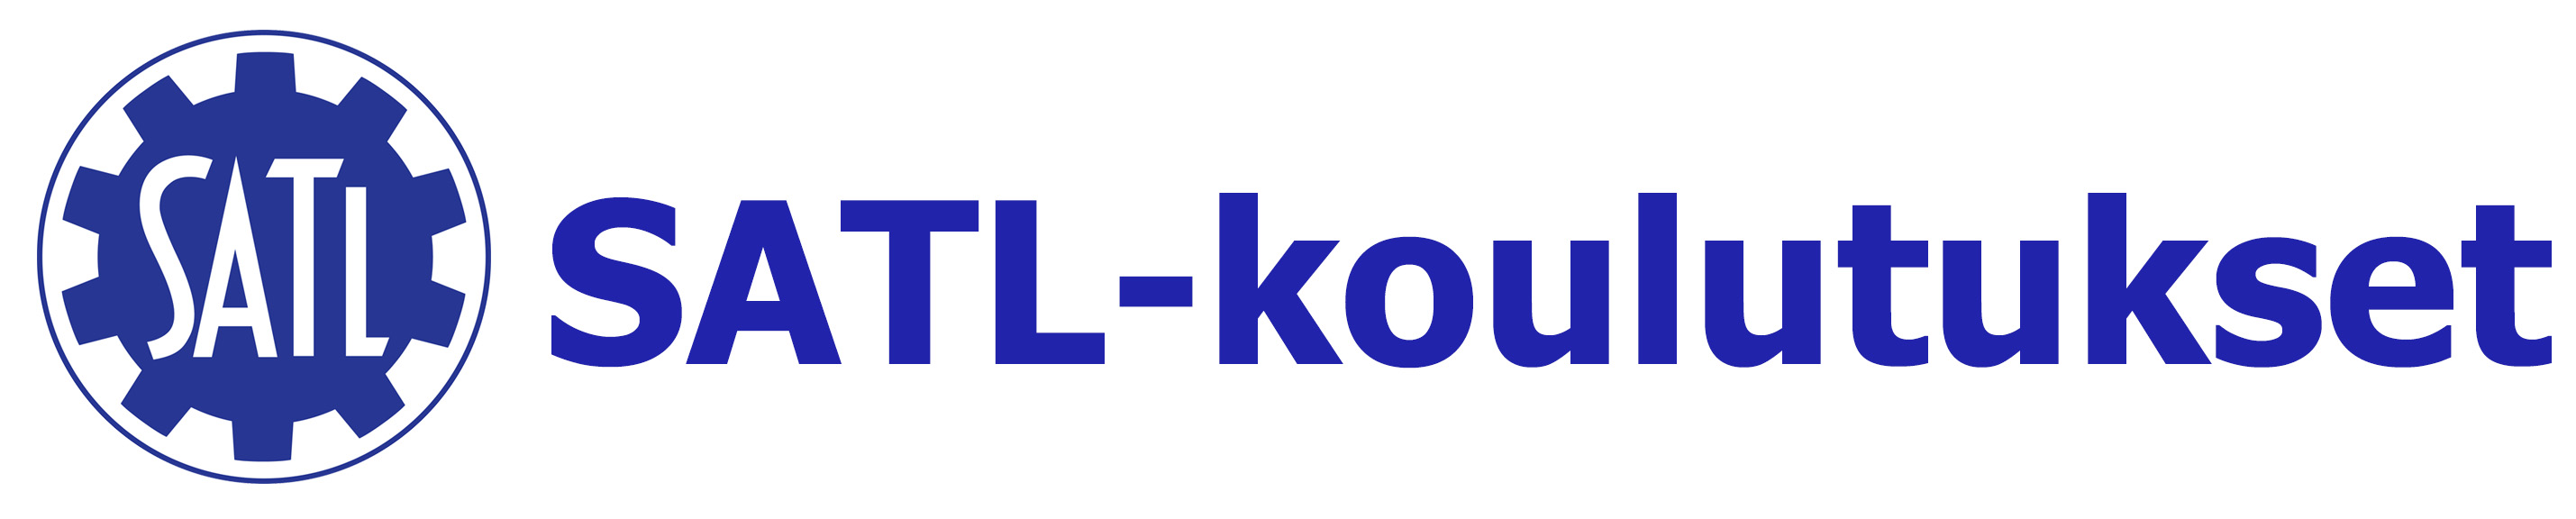 Satl koulutukset logo